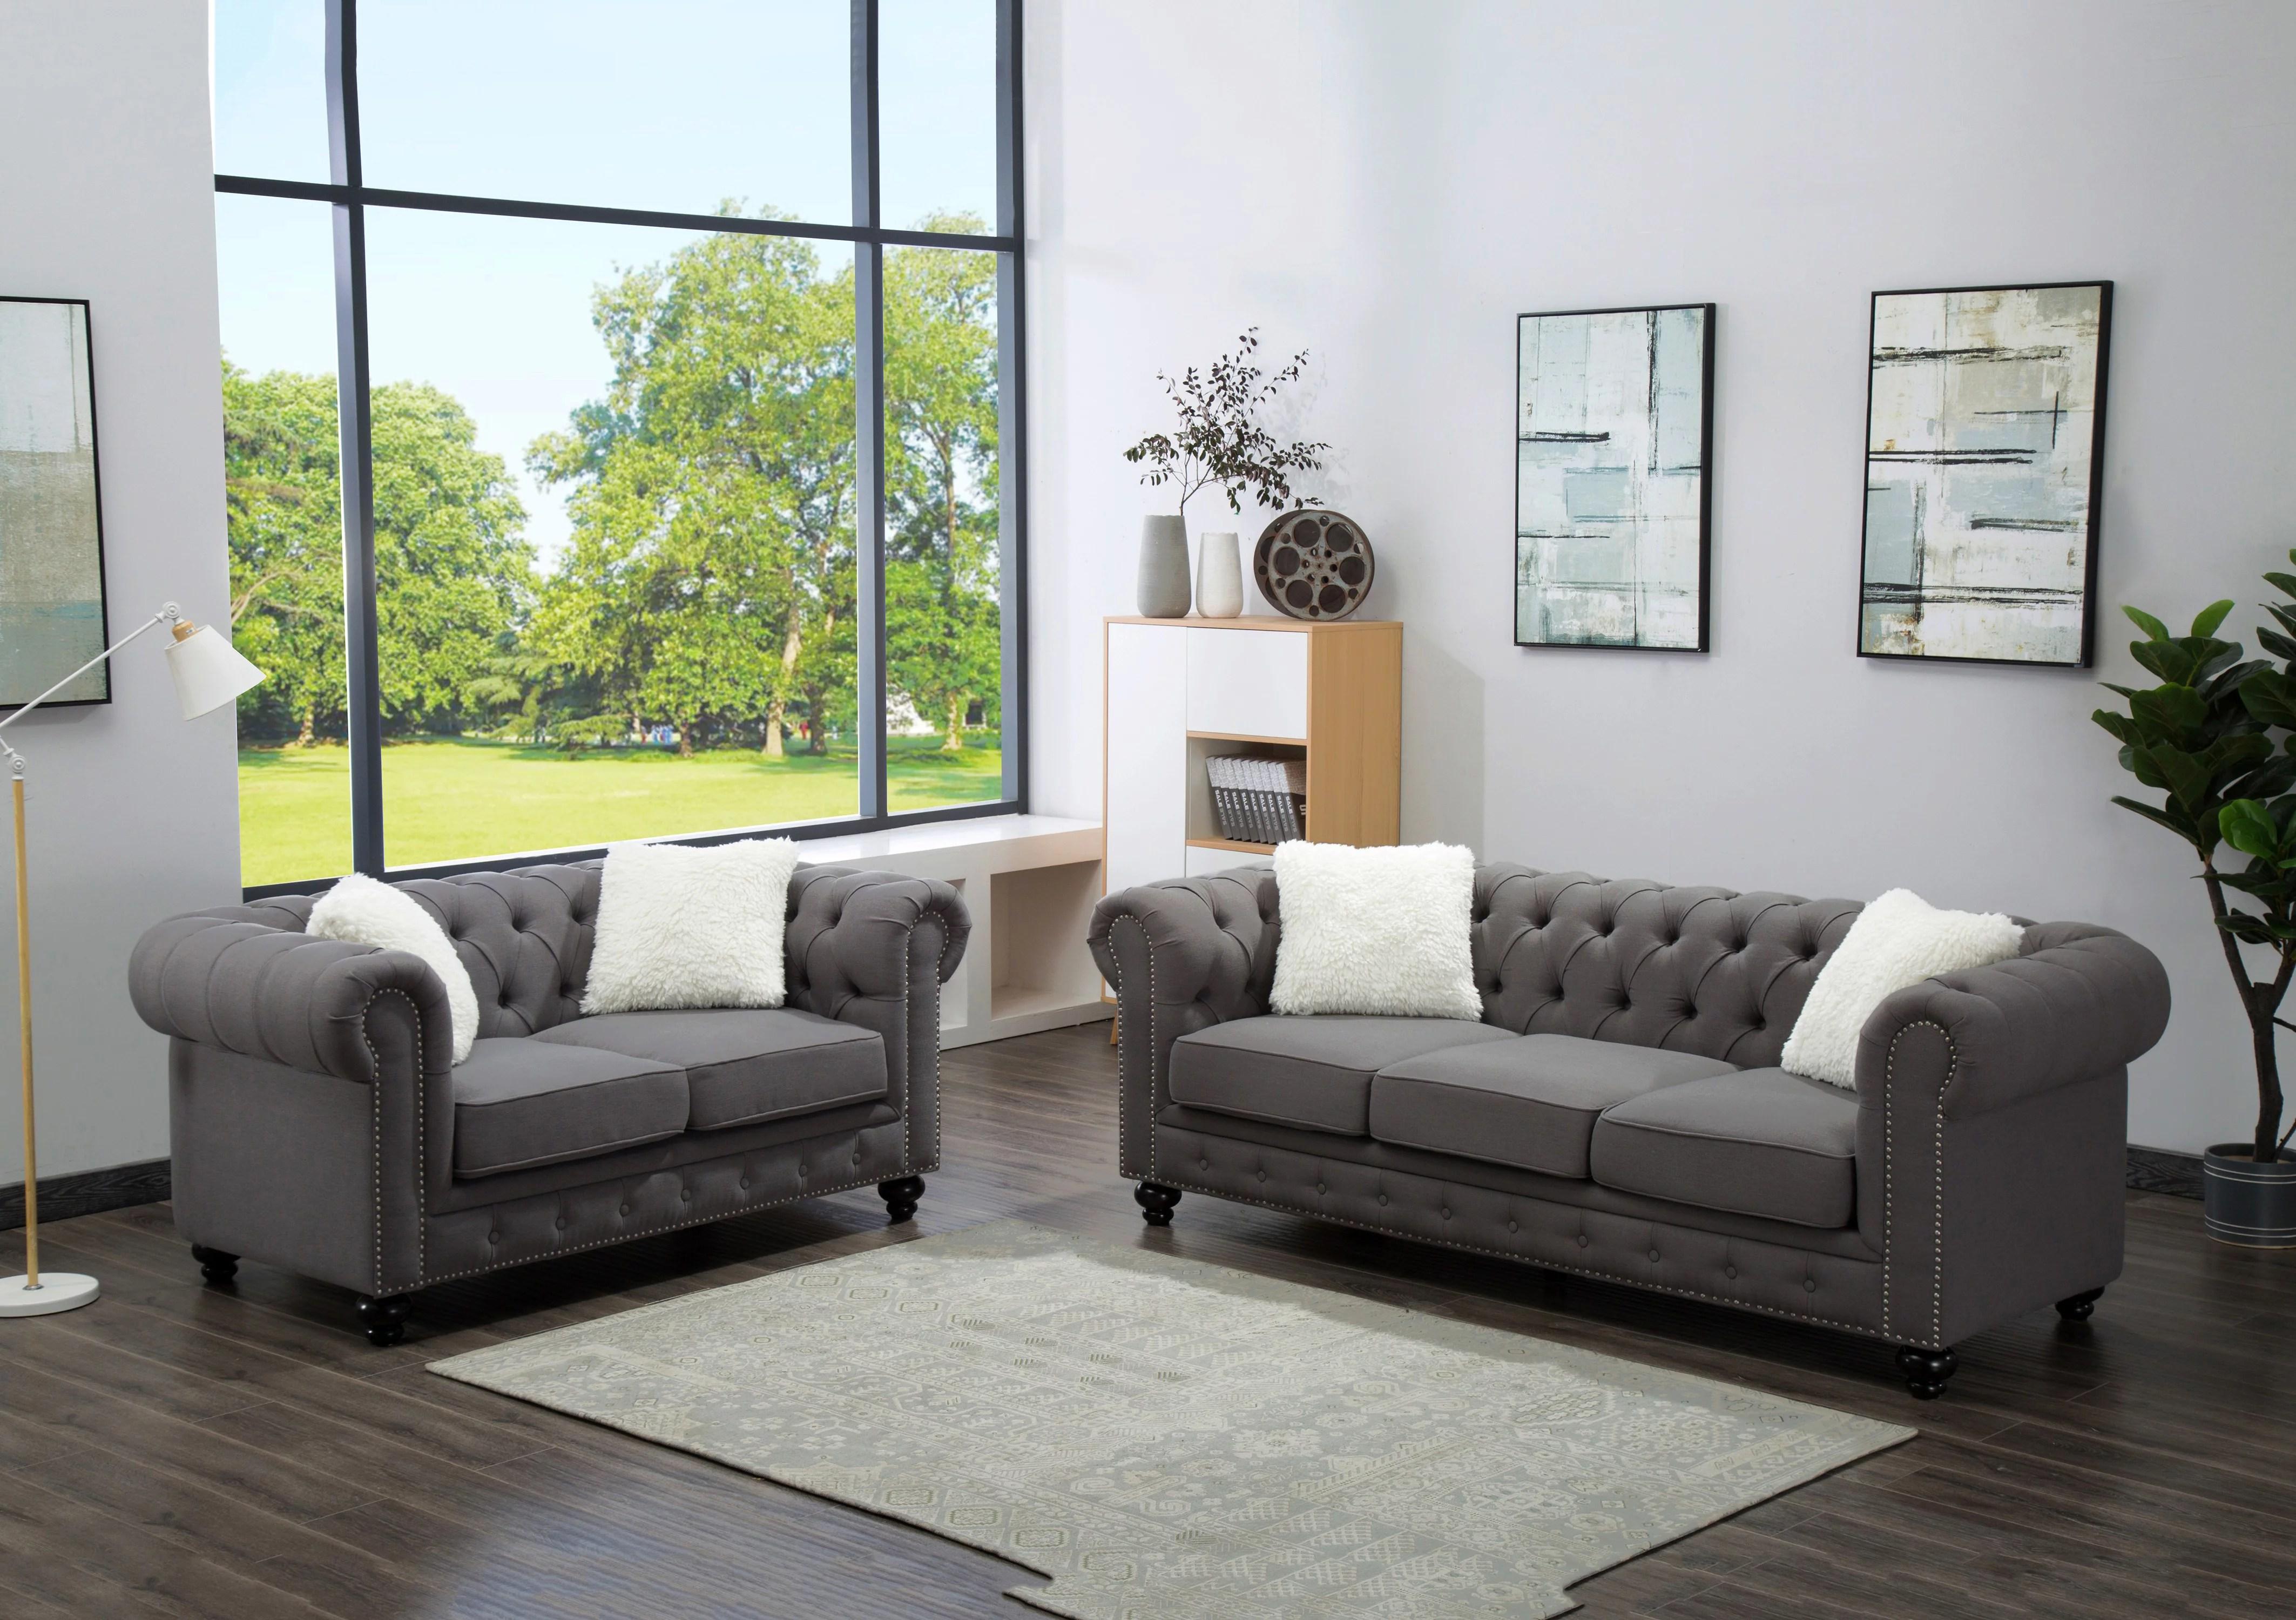 Best Quality Furniture Living Room set Sofa  Loveseat